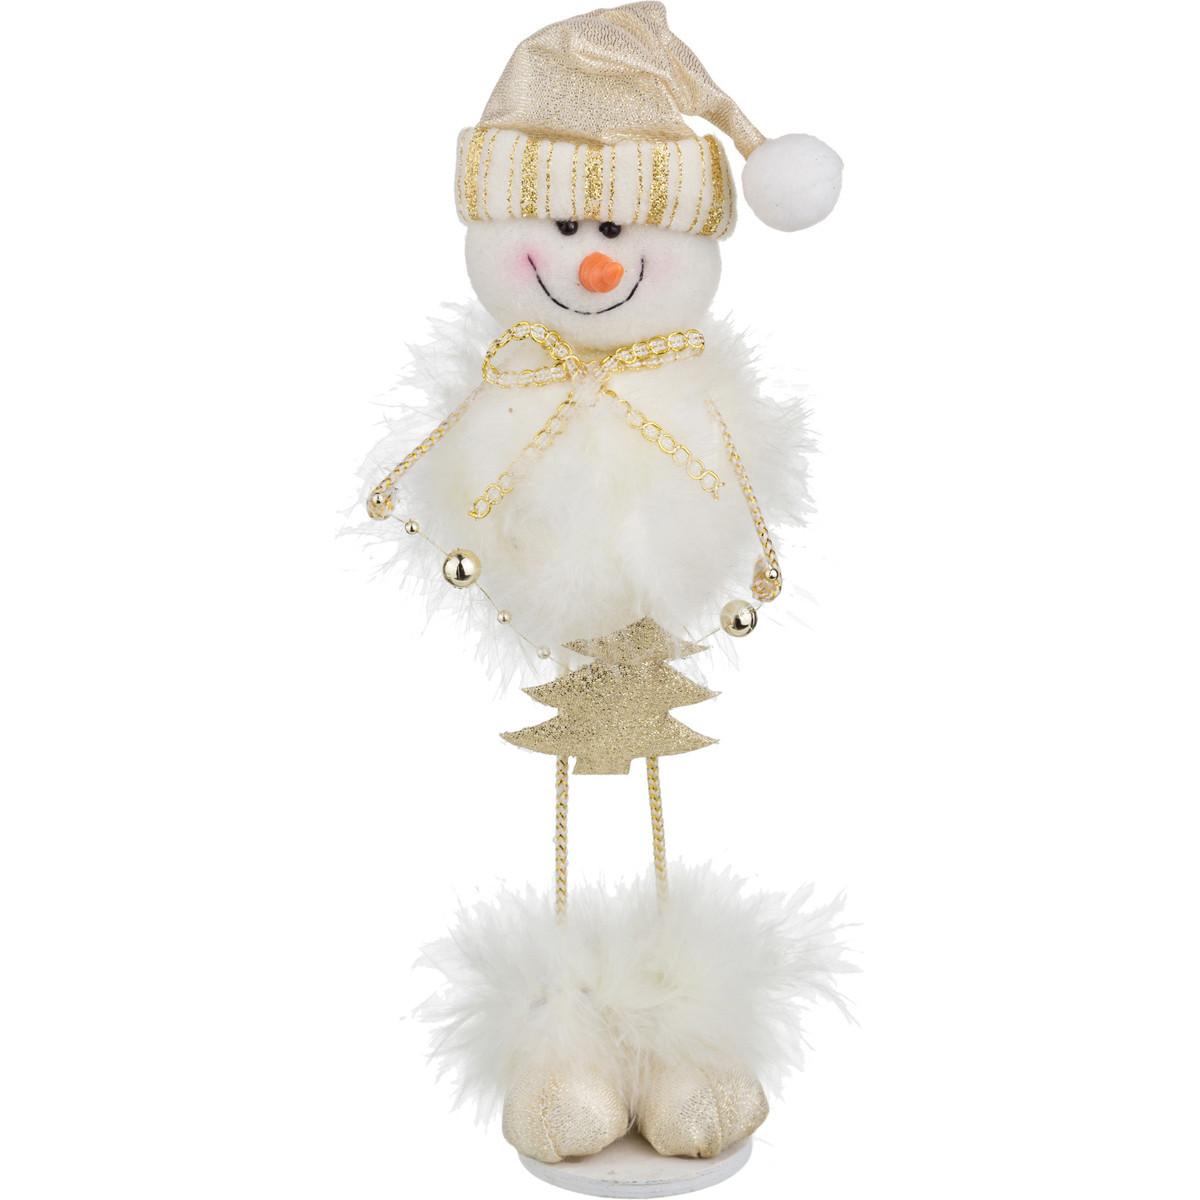 {} Lefard Интерьерная игрушка Lolipop  (22 см) lefard интерьерная игрушка jan 5х6х13 см